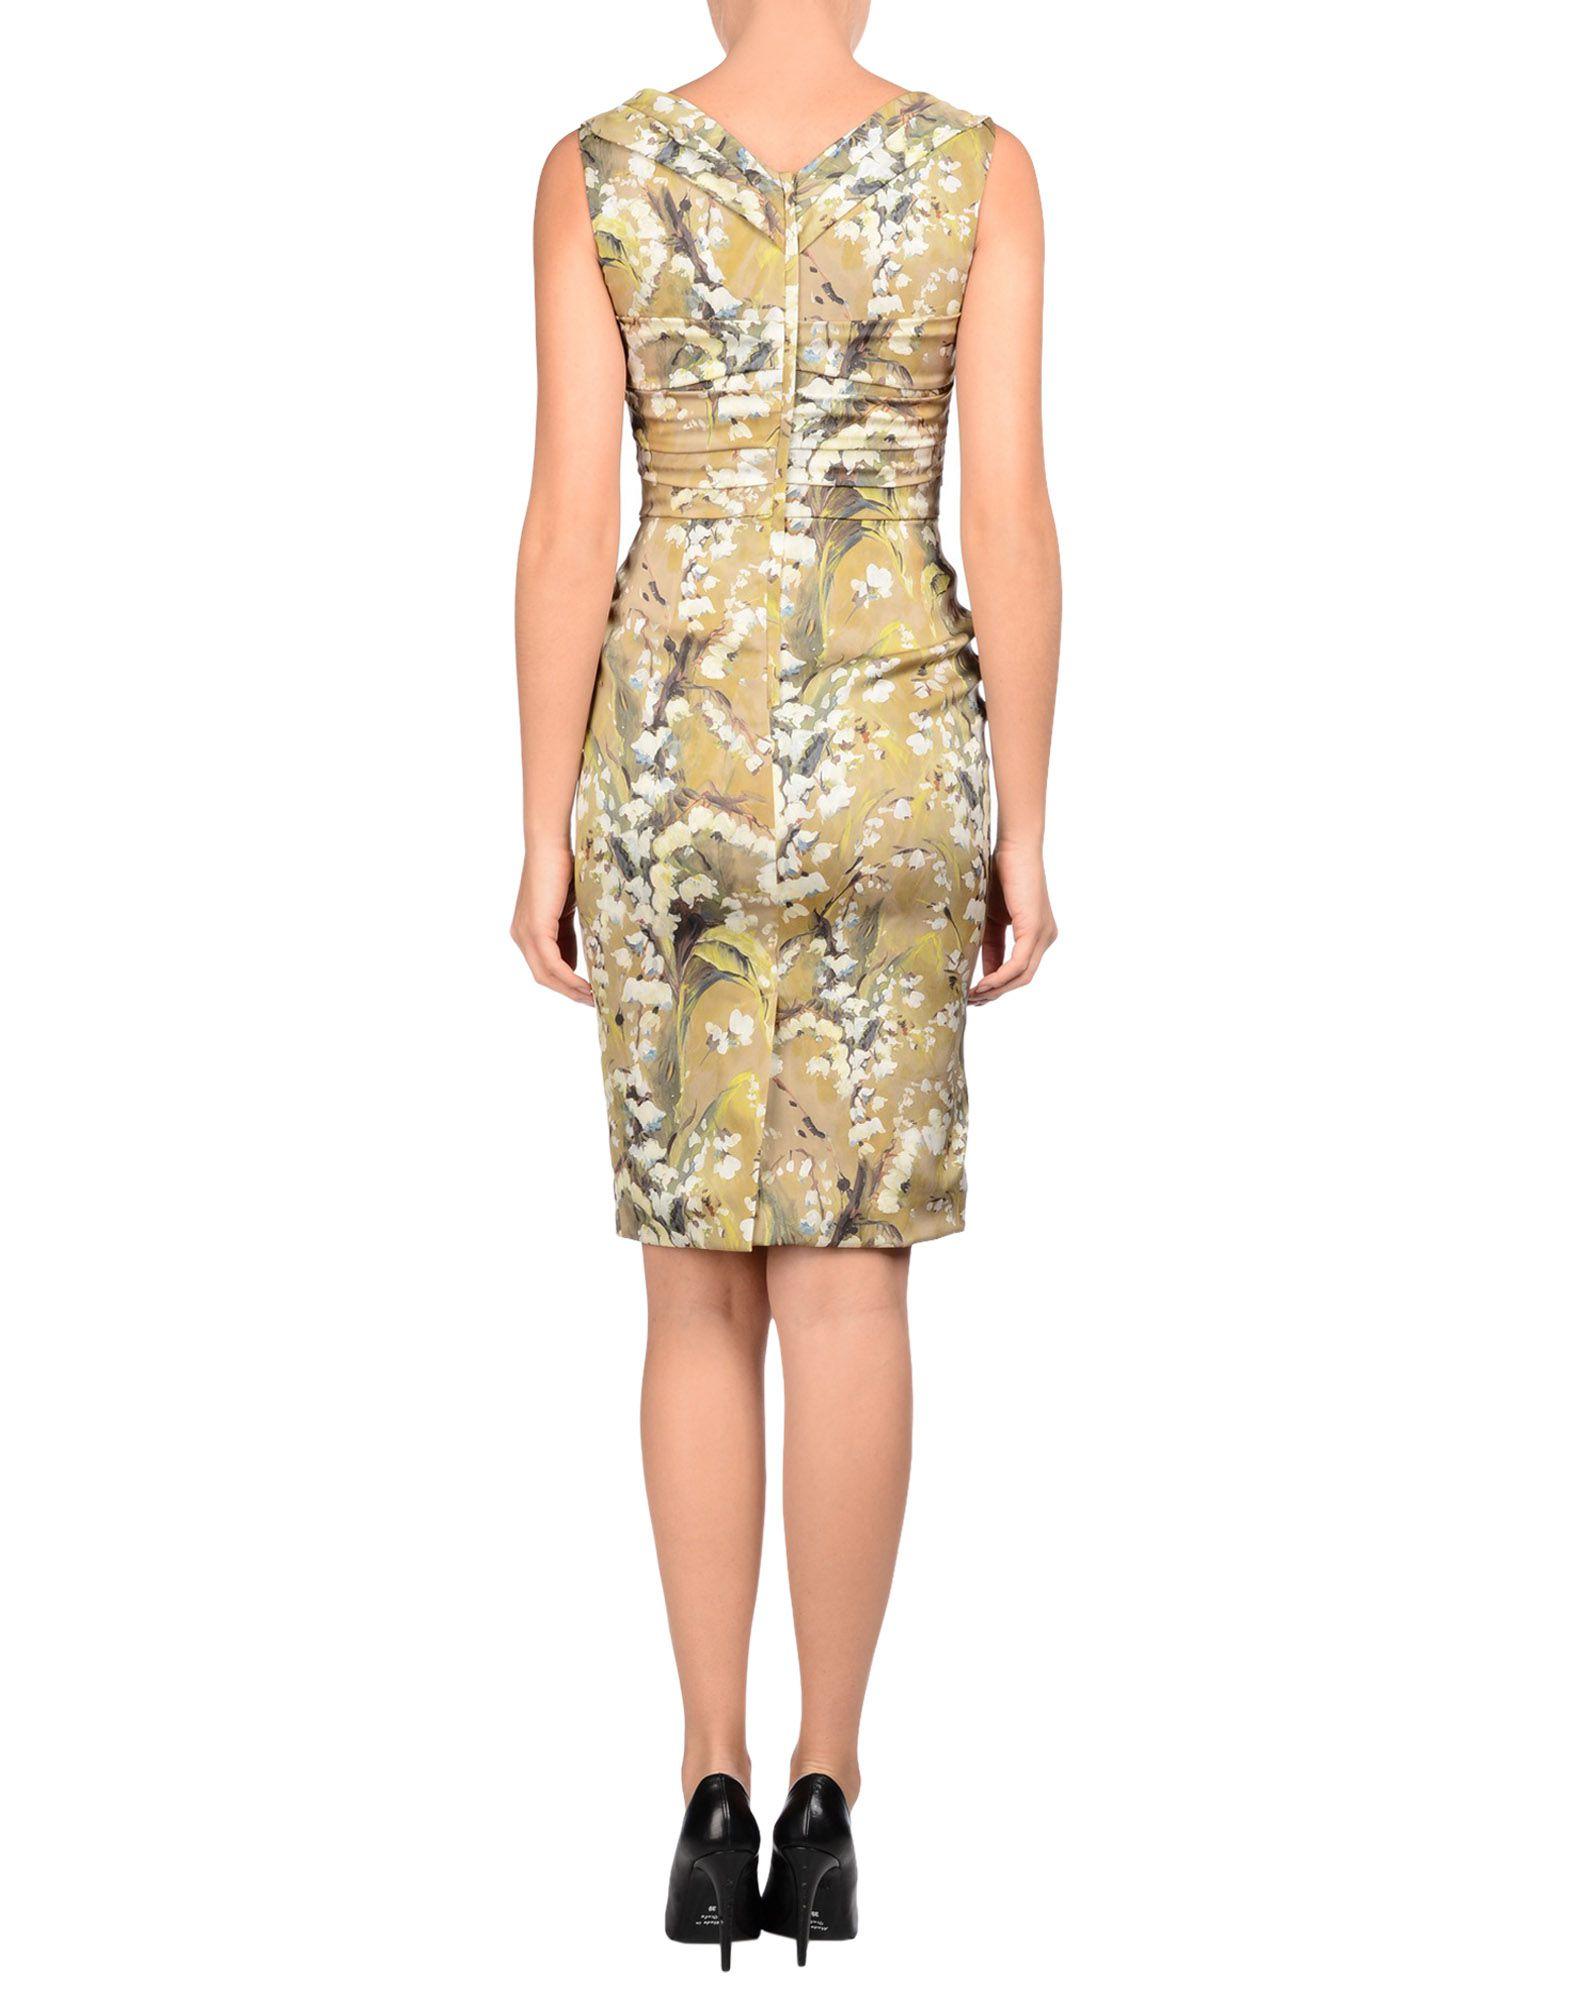 c33671c539e Lyst - Dolce   Gabbana Short Dress in Green